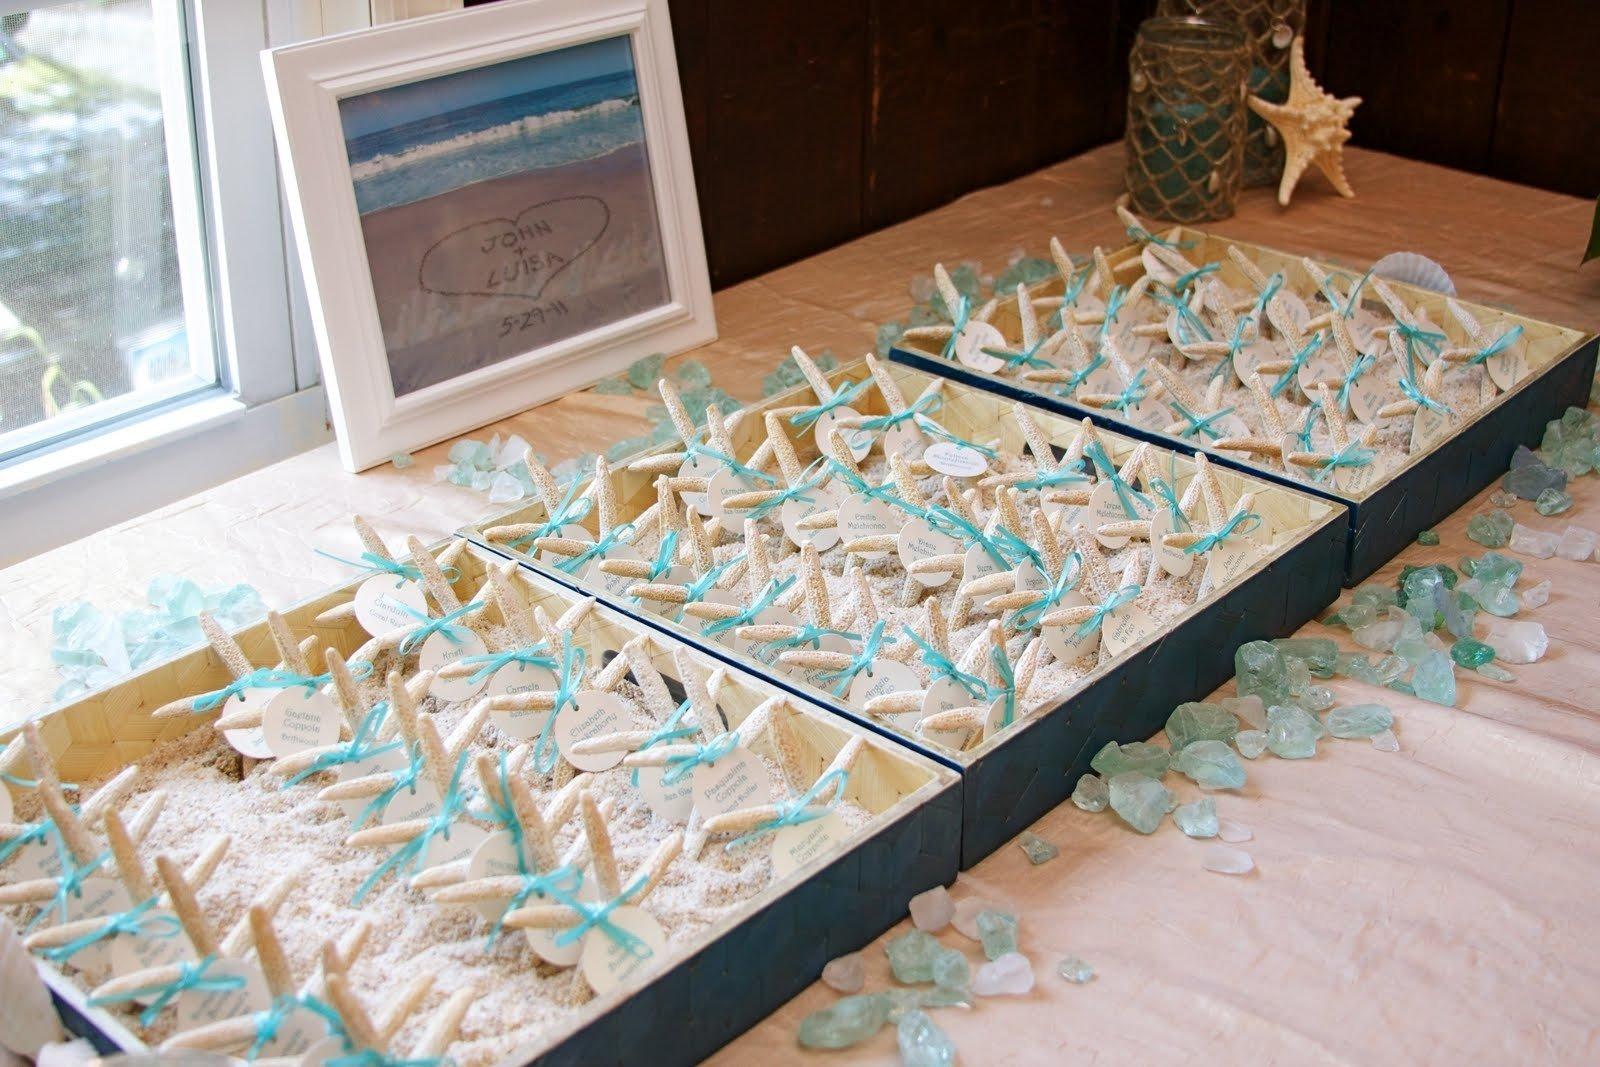 10 Most Popular Beach Themed Bridal Shower Ideas the best beach themed bridal shower decorations and champagne bar 2020